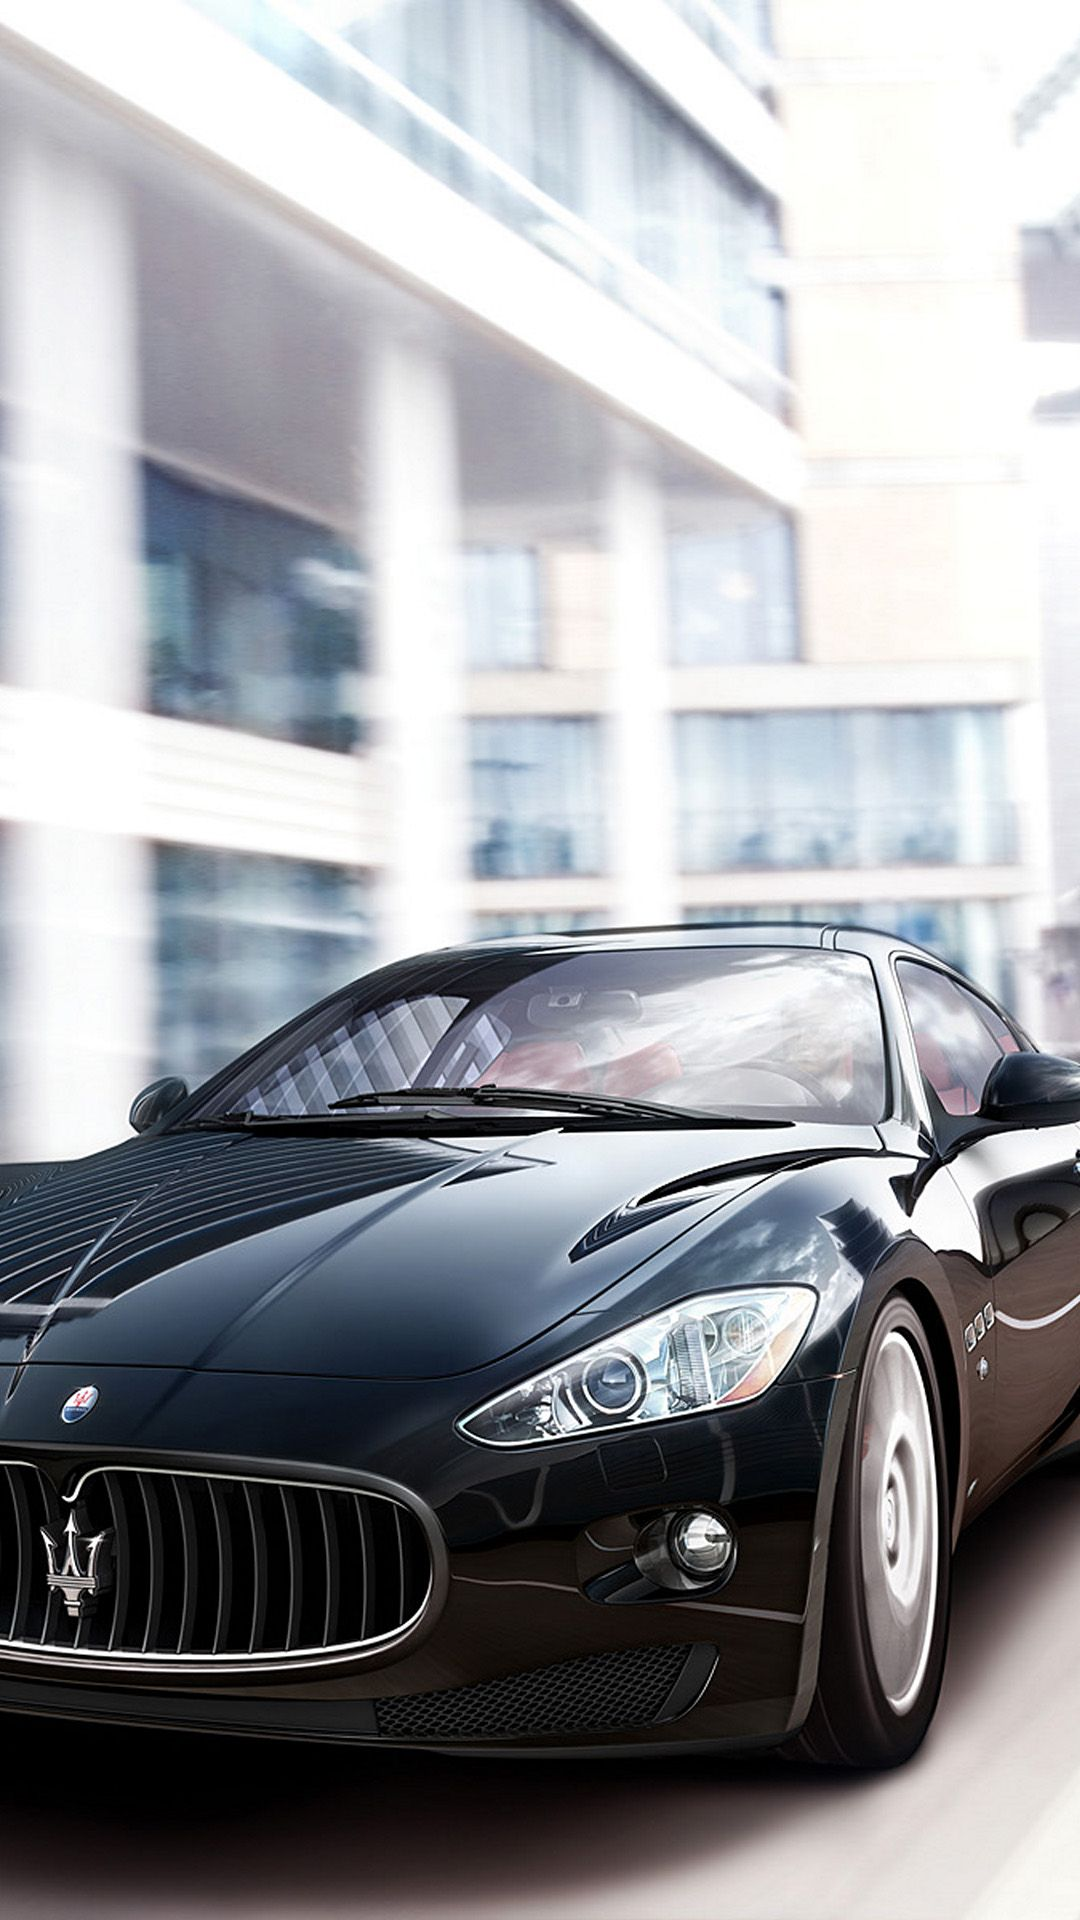 Maserati Granturismo S Black Best Htc One Wallpapers Maserati Car Maserati Granturismo Maserati Granturismo S